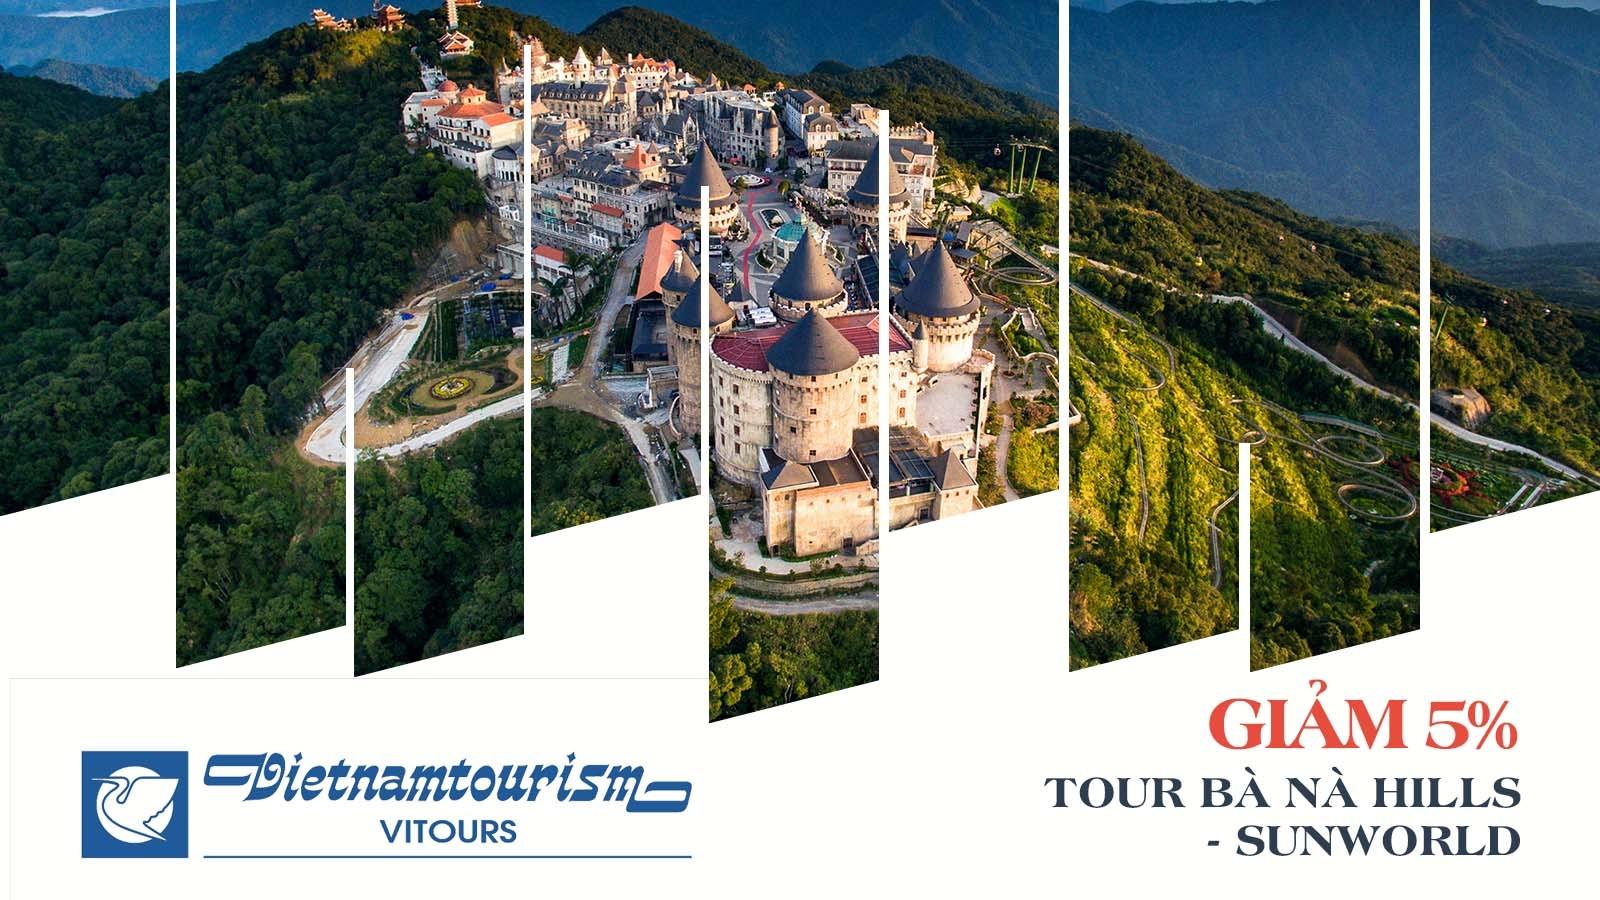 Vitours giảm 5% tour Bà Nà Hills - Sunworld 1